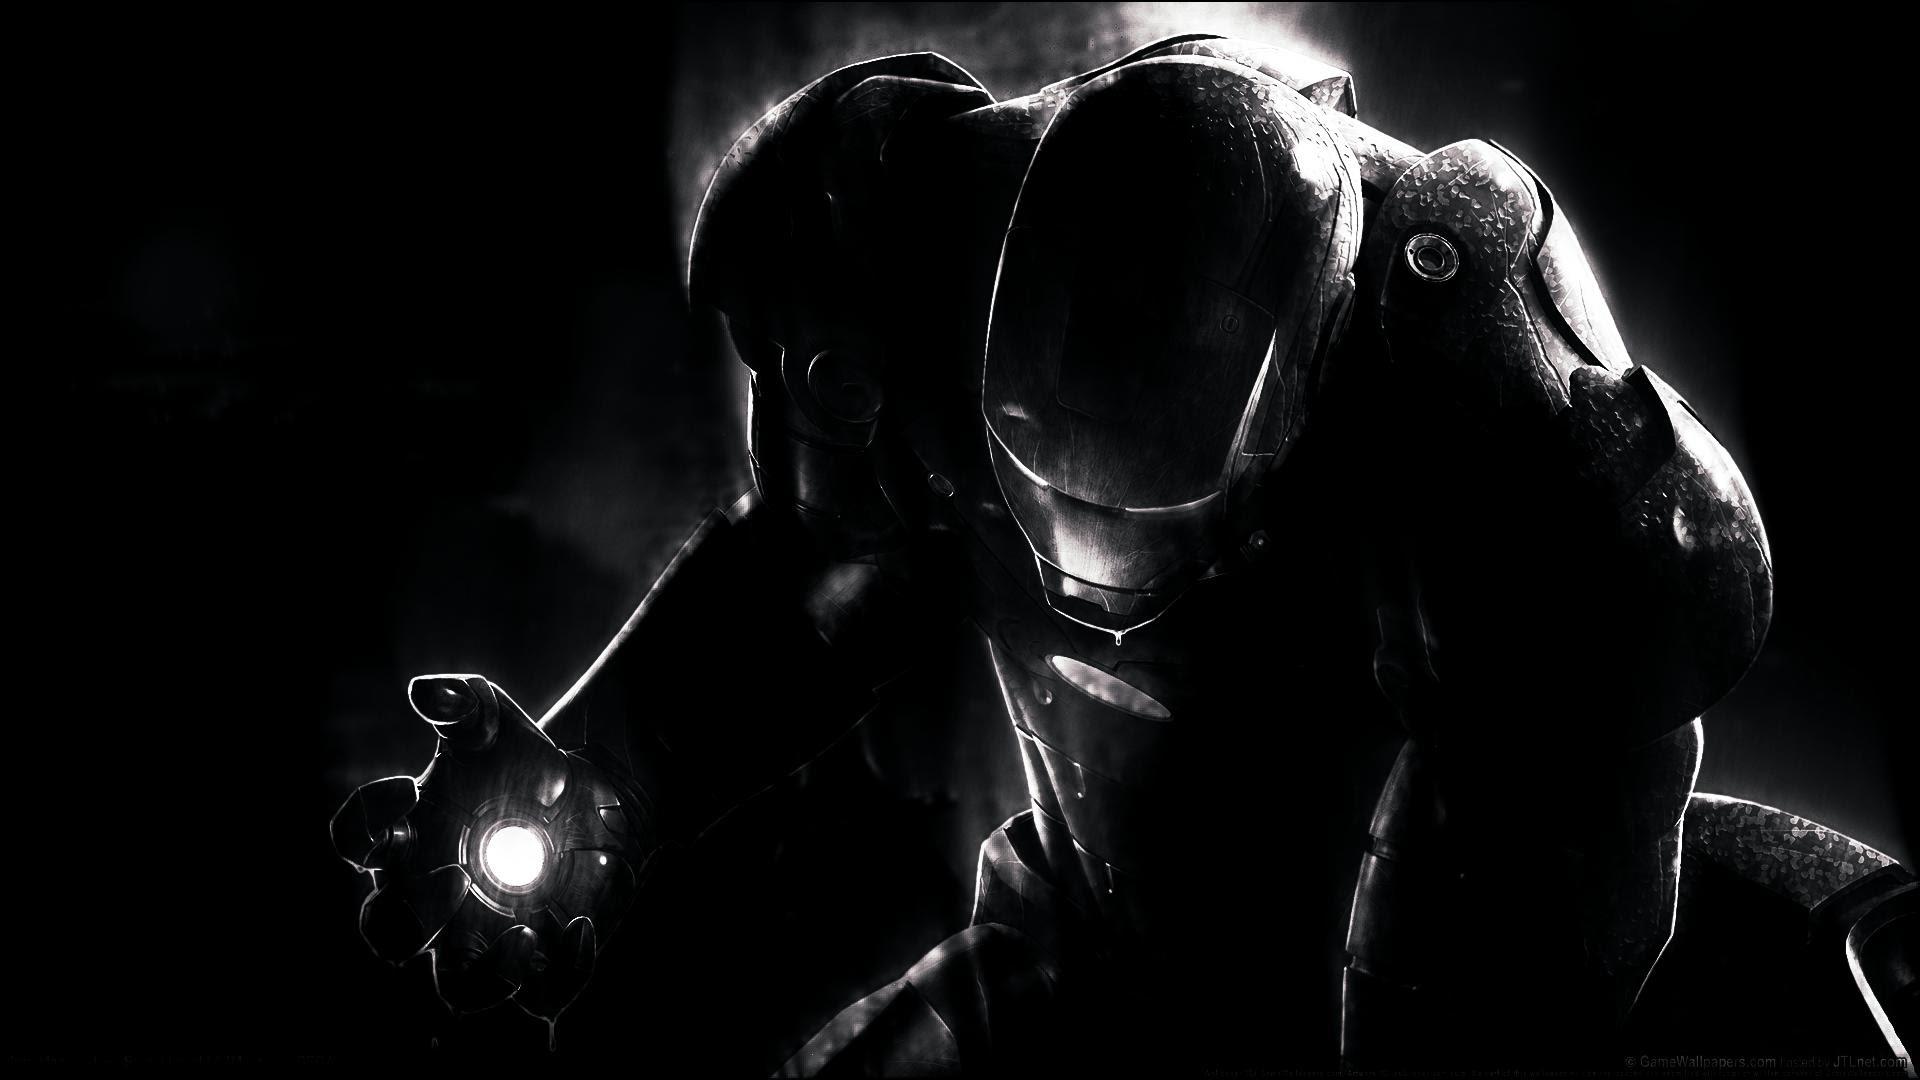 Iron Man Hd Wallpaper 1920x1080 43339